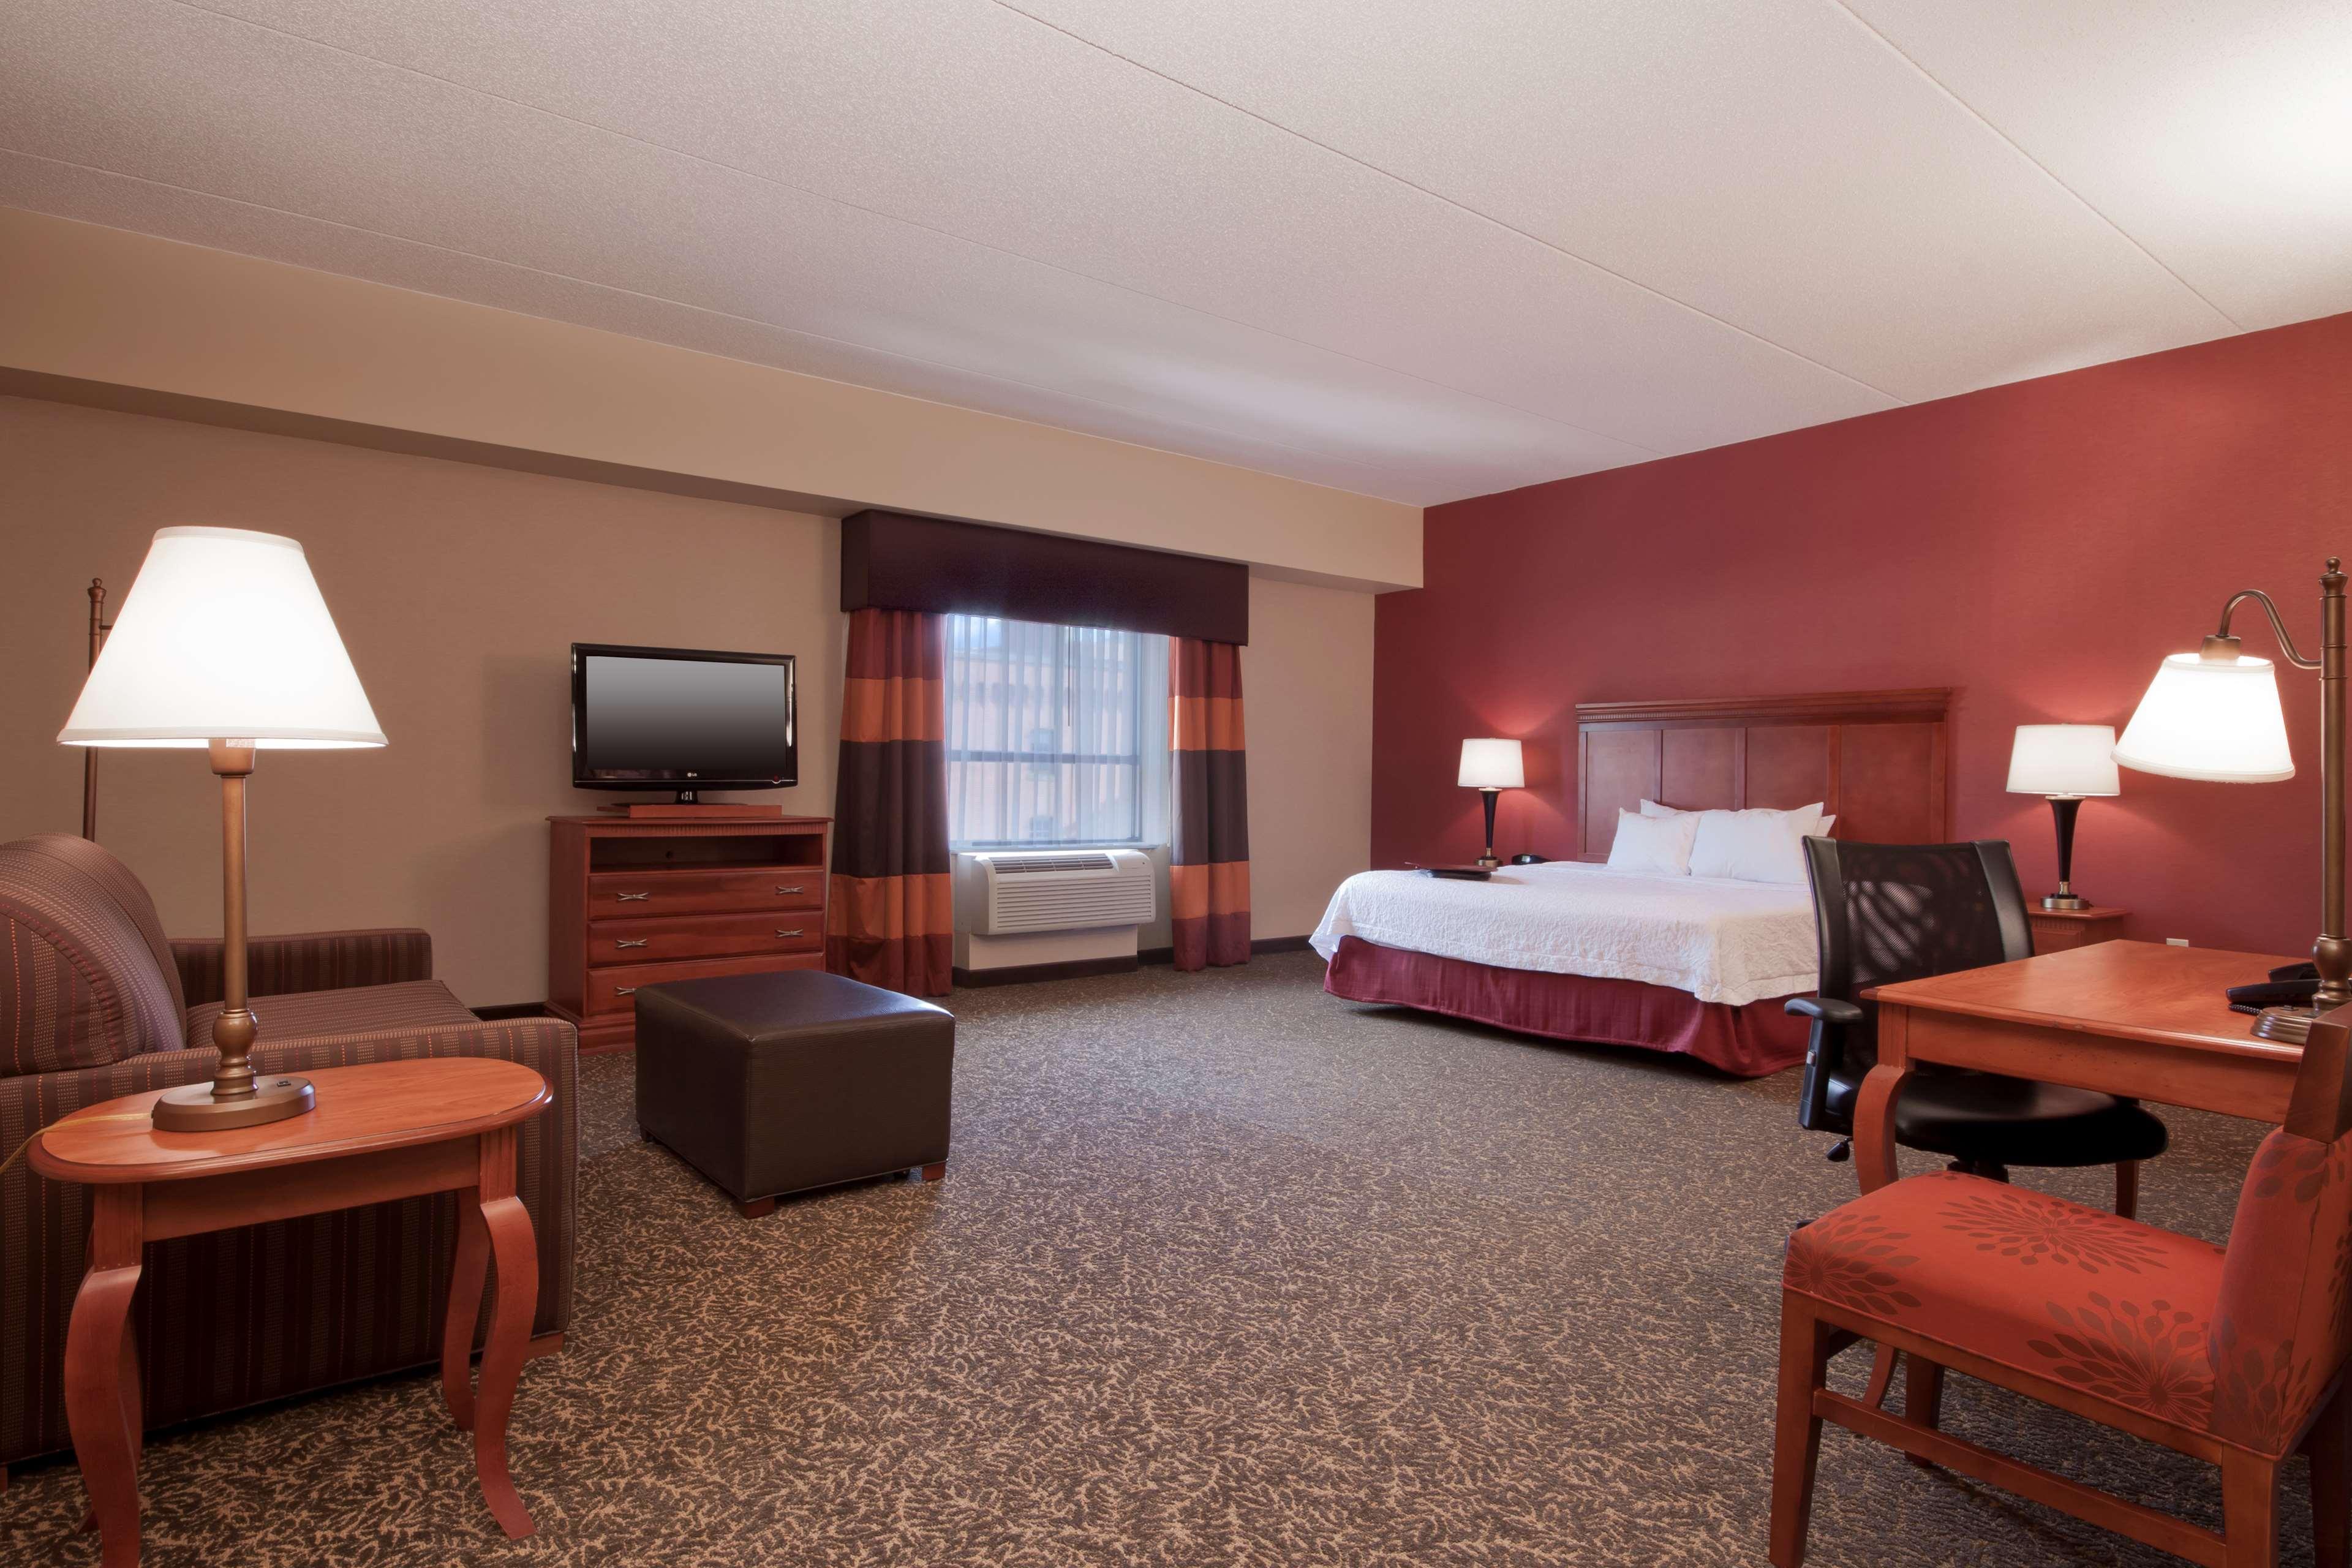 Hampton Inn & Suites Pittsburgh-Downtown image 15